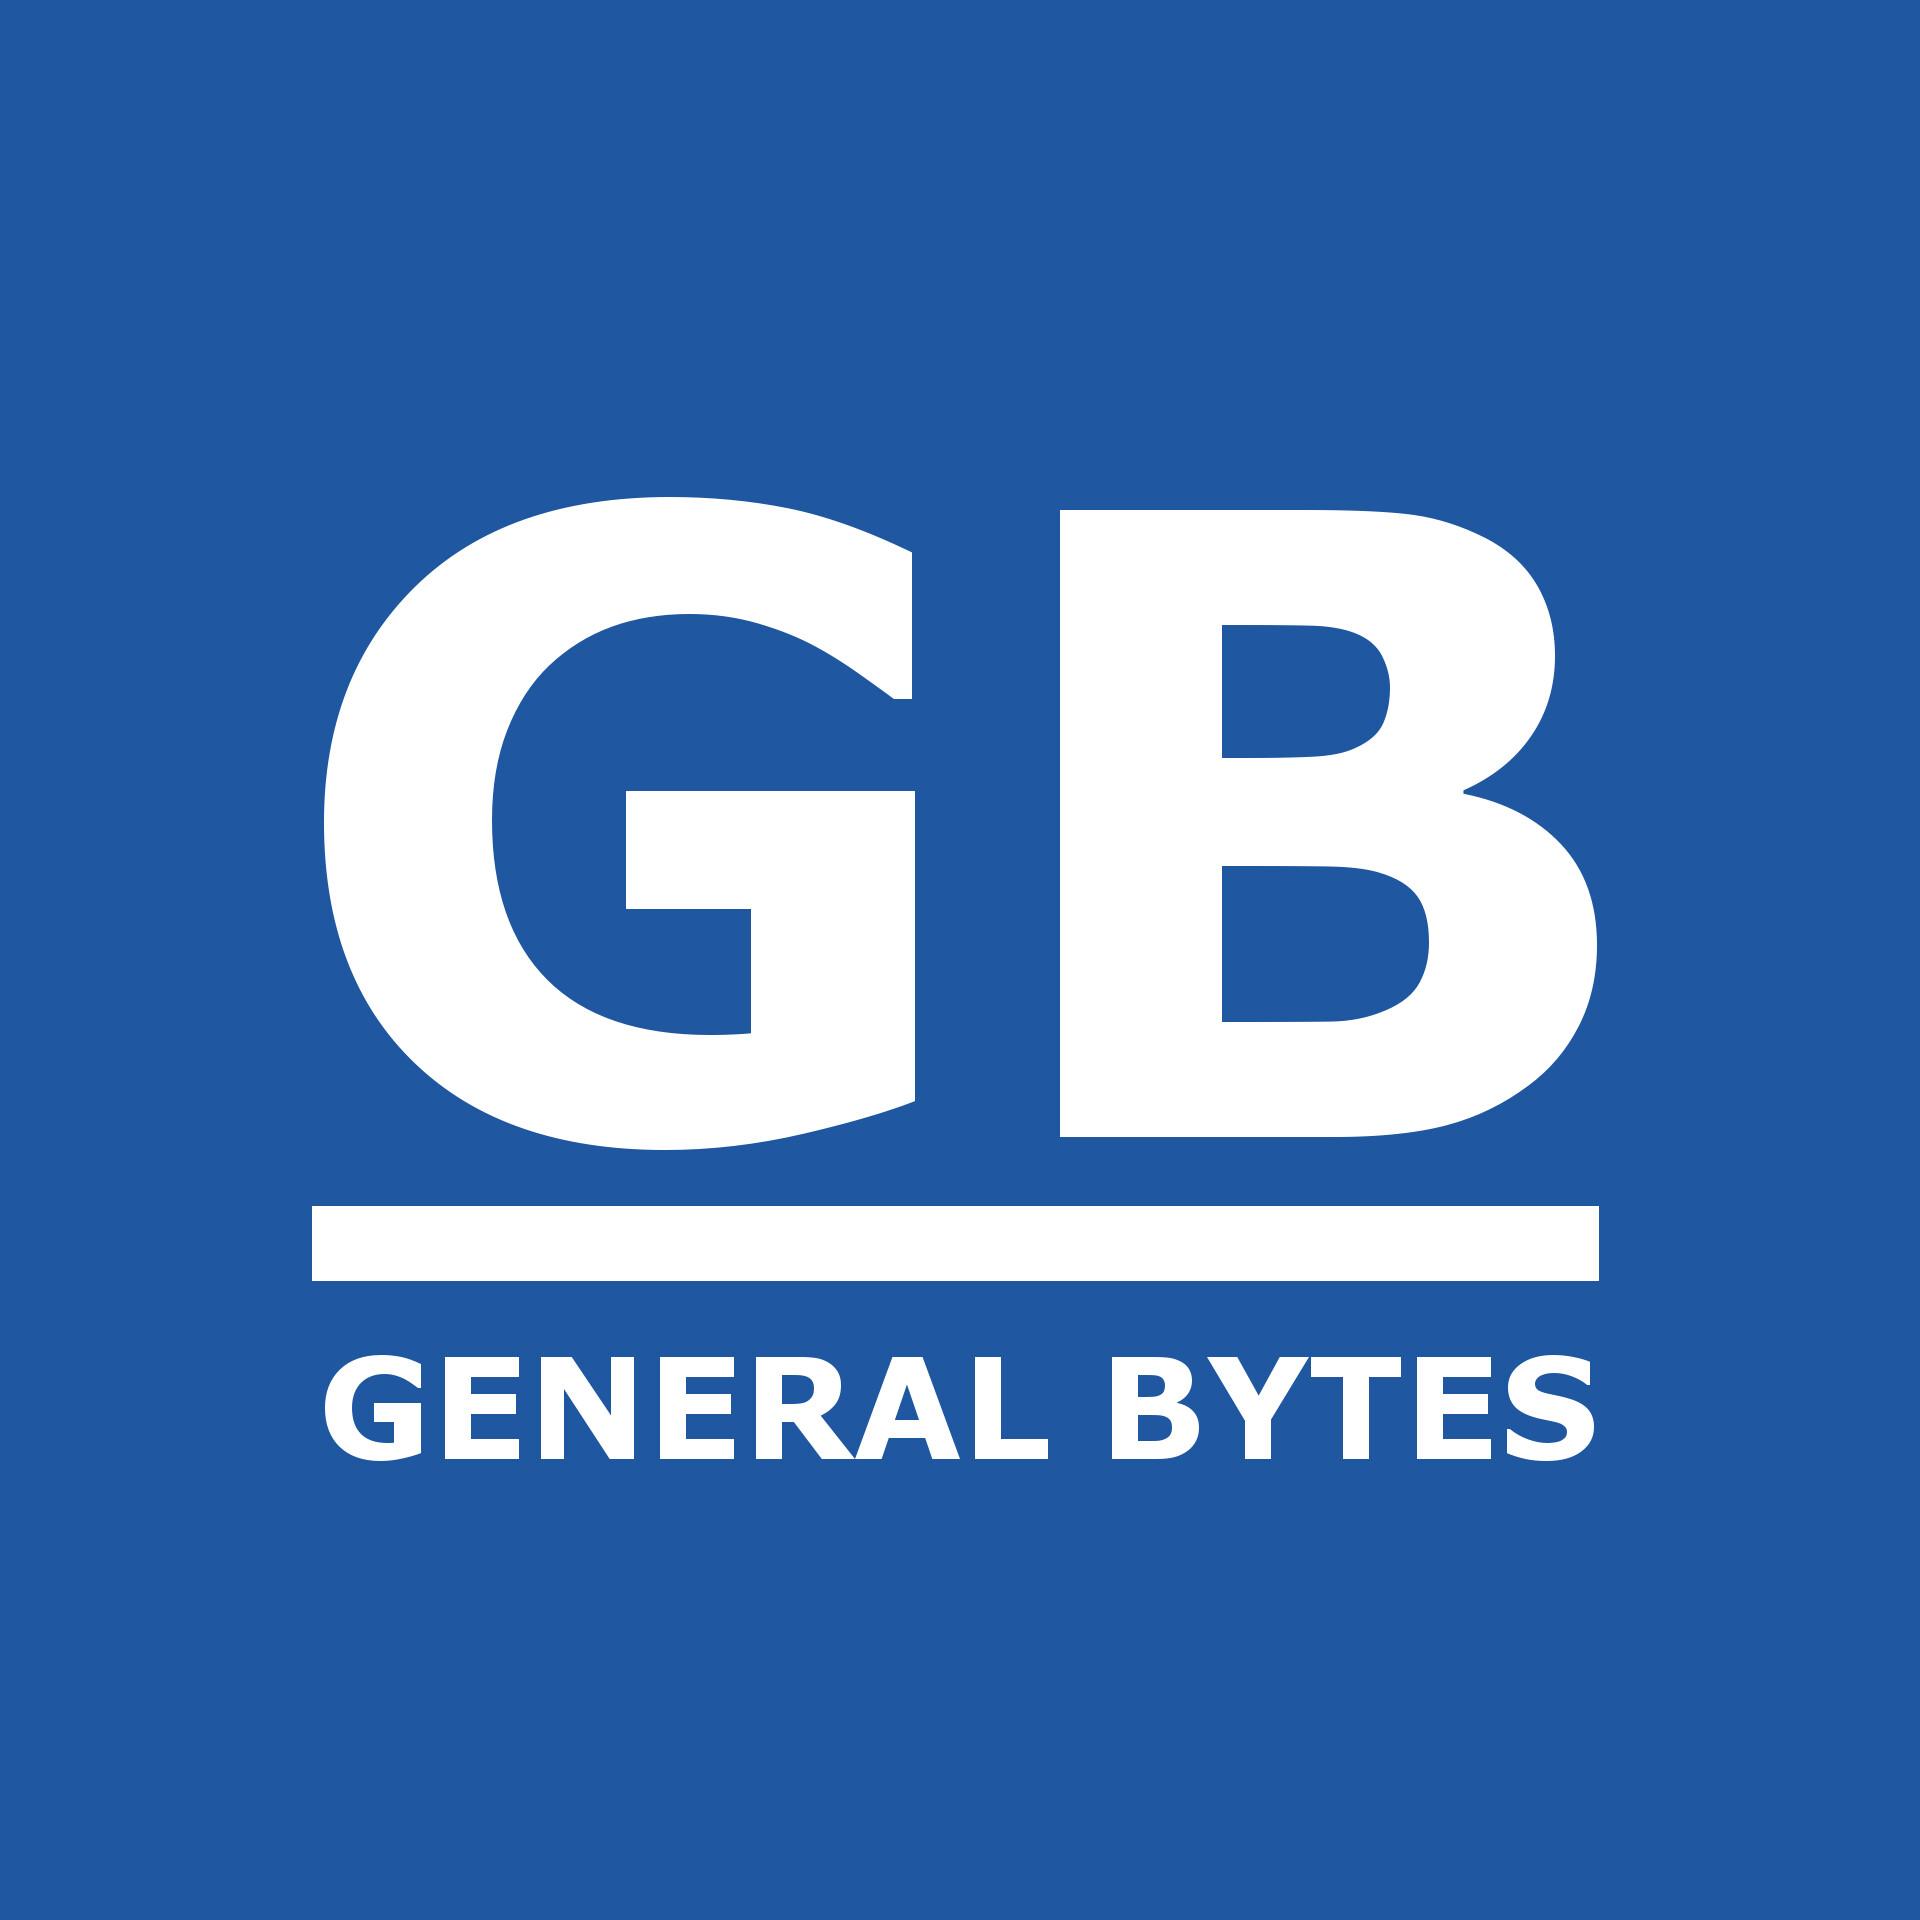 GENERAL BYTES